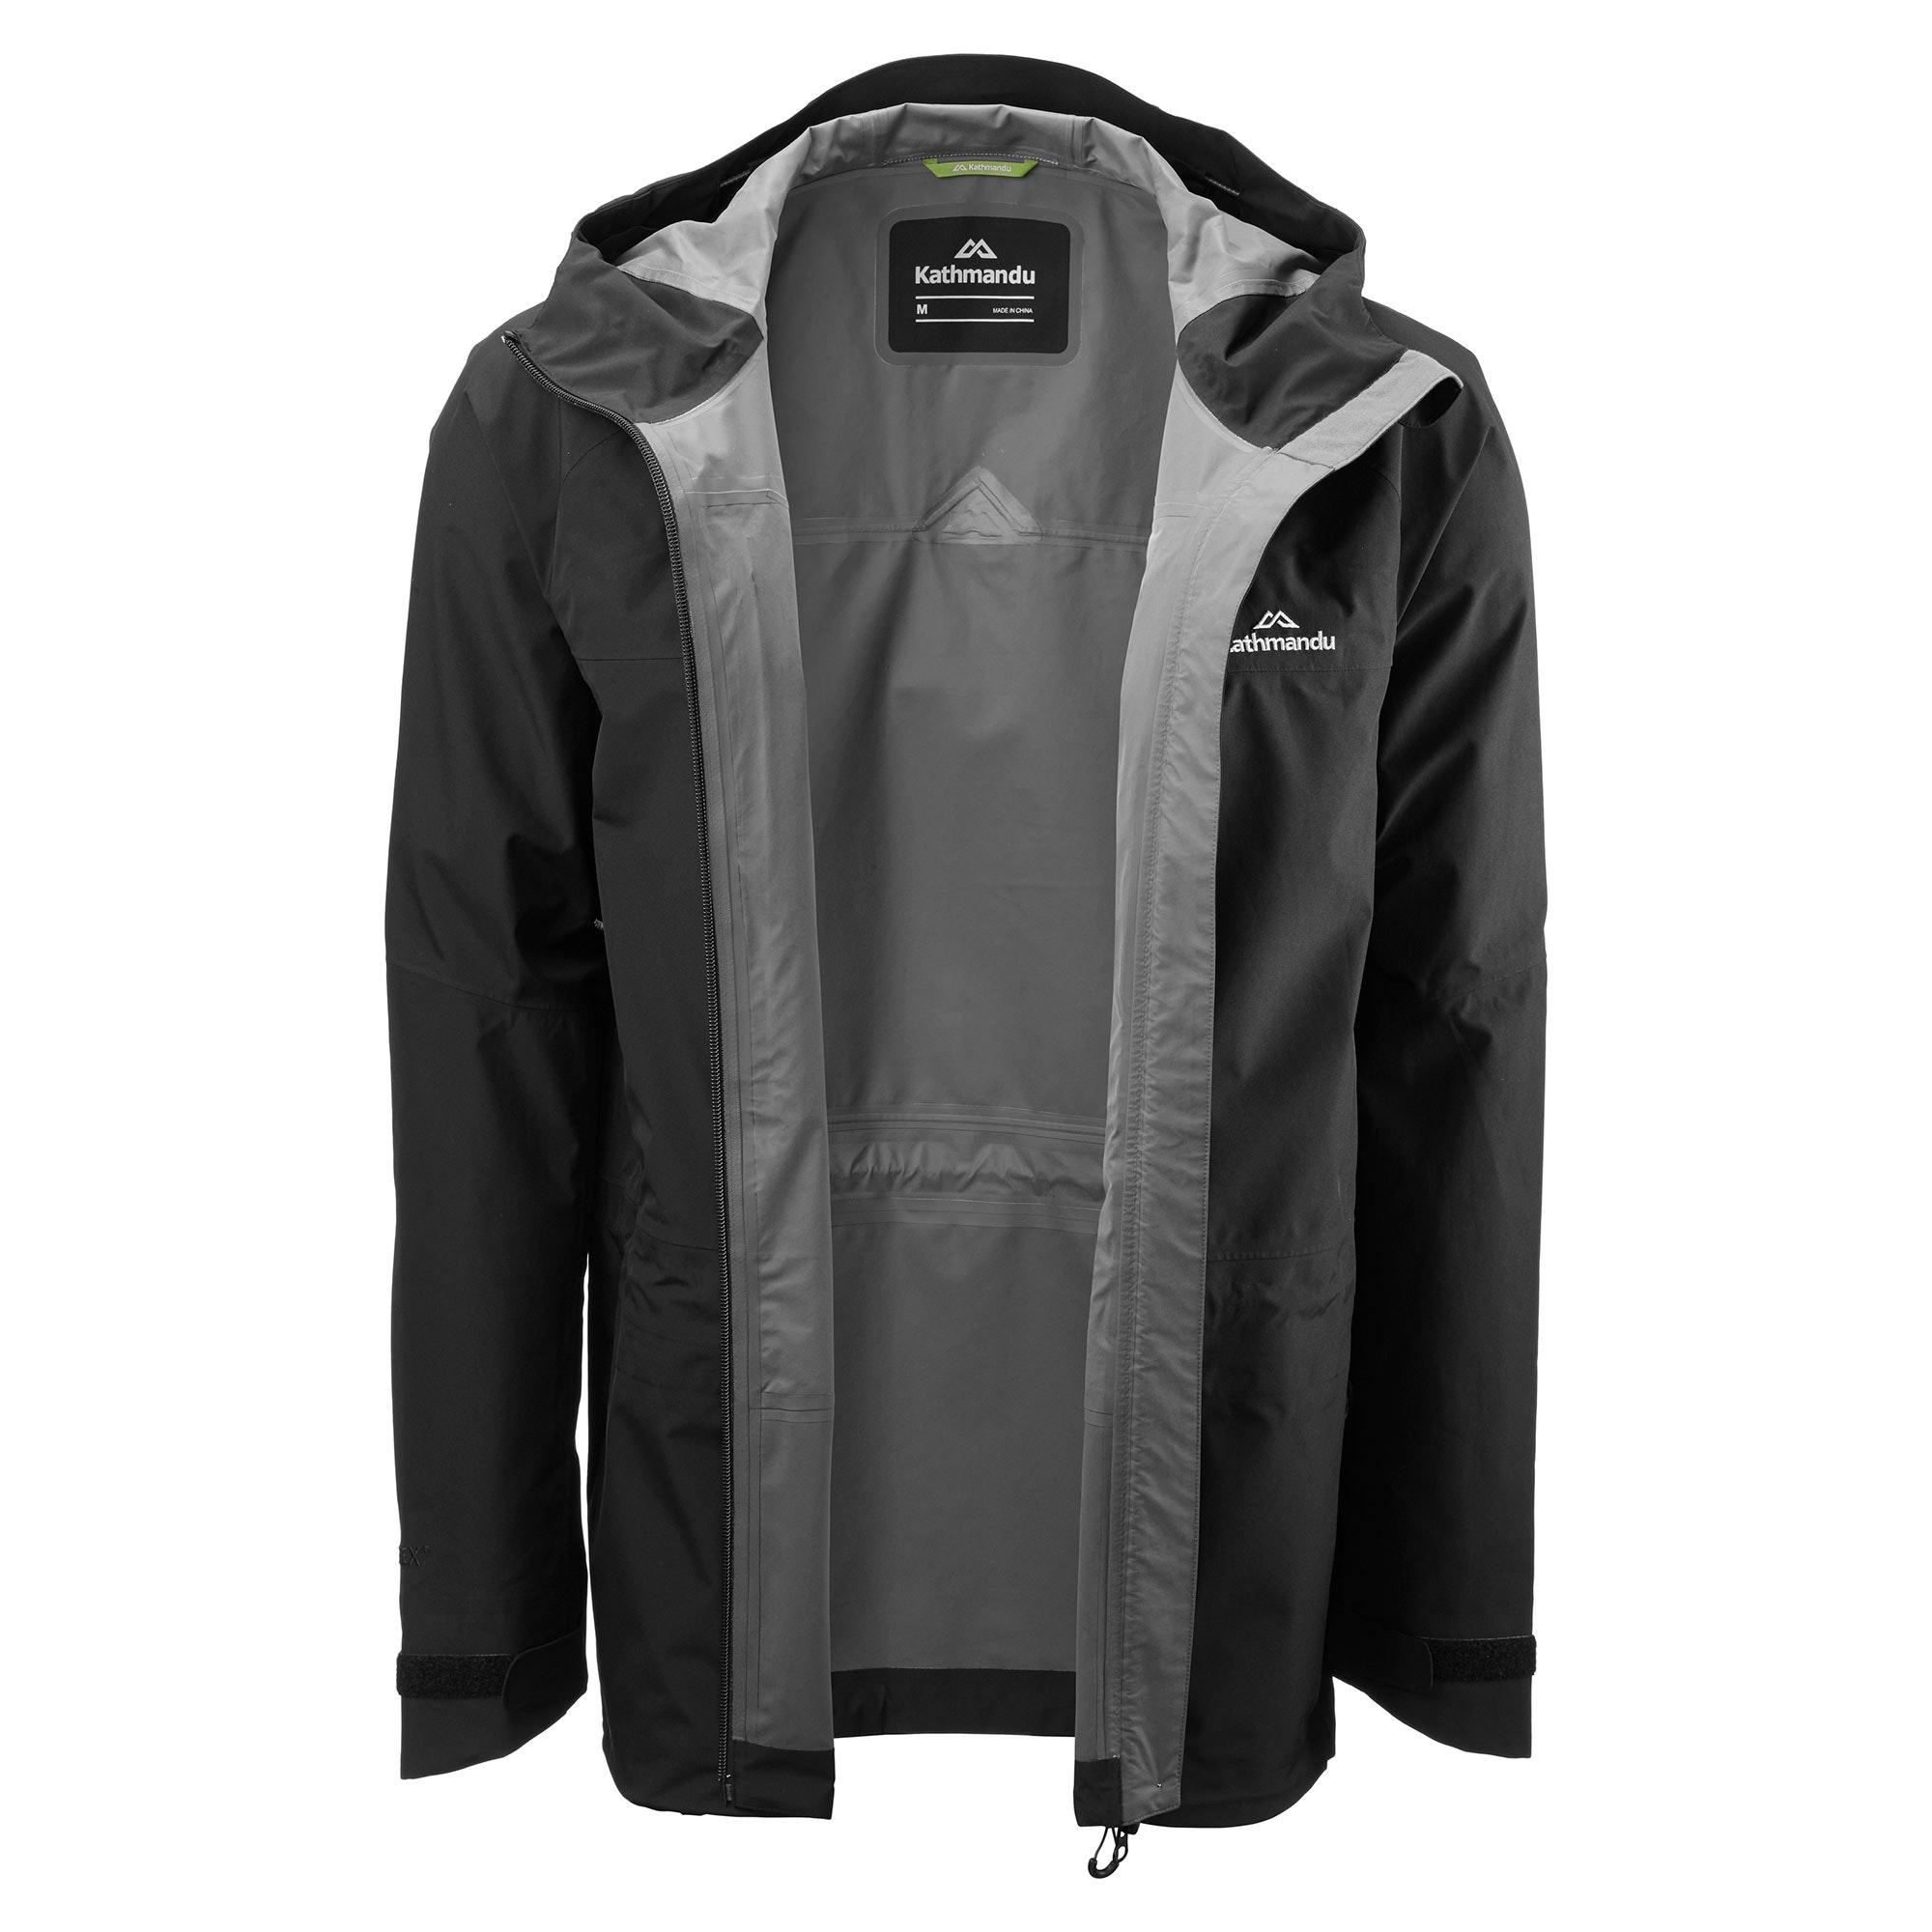 NEW-Kathmandu-Aysen-Men-039-s-GORE-TEX-Windproof-Waterproof-Outdoor-Rain-Jacket thumbnail 5